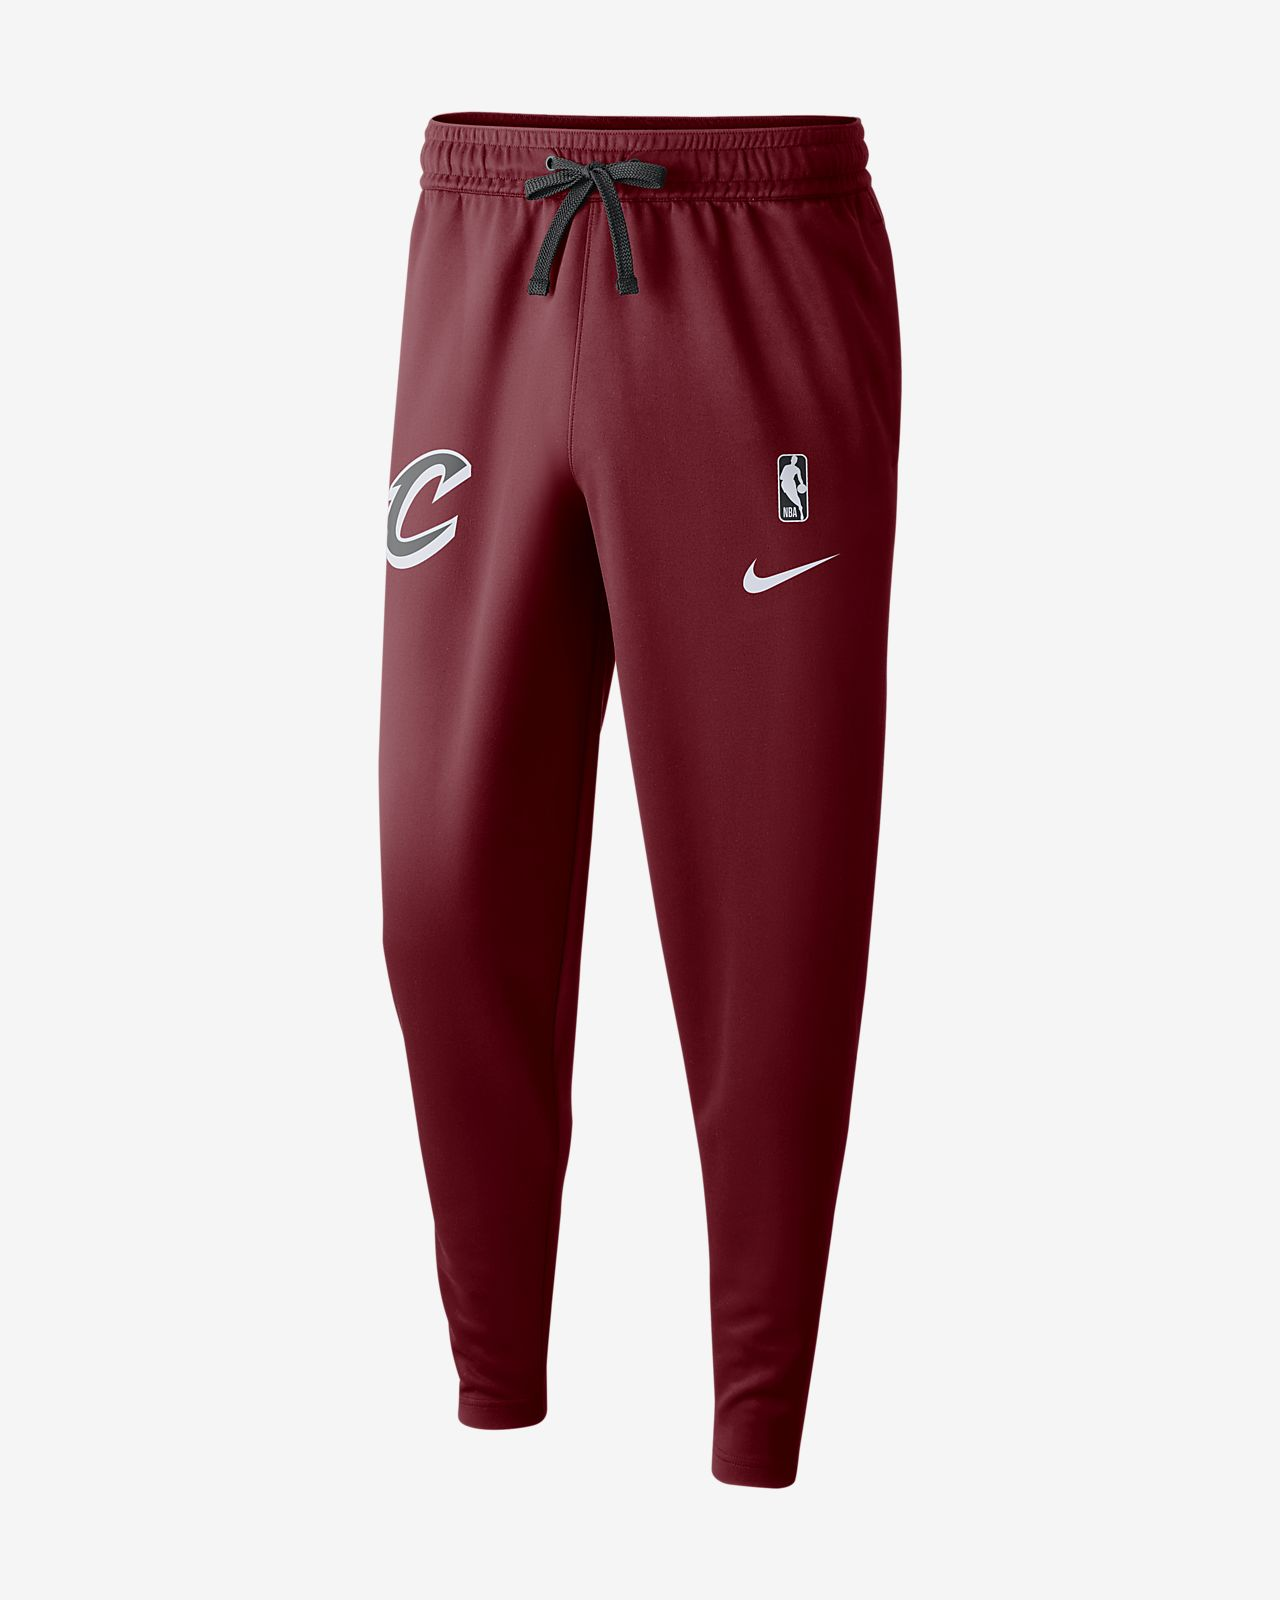 Cleveland Cavaliers Nike Spotlight NBA-herenbroek